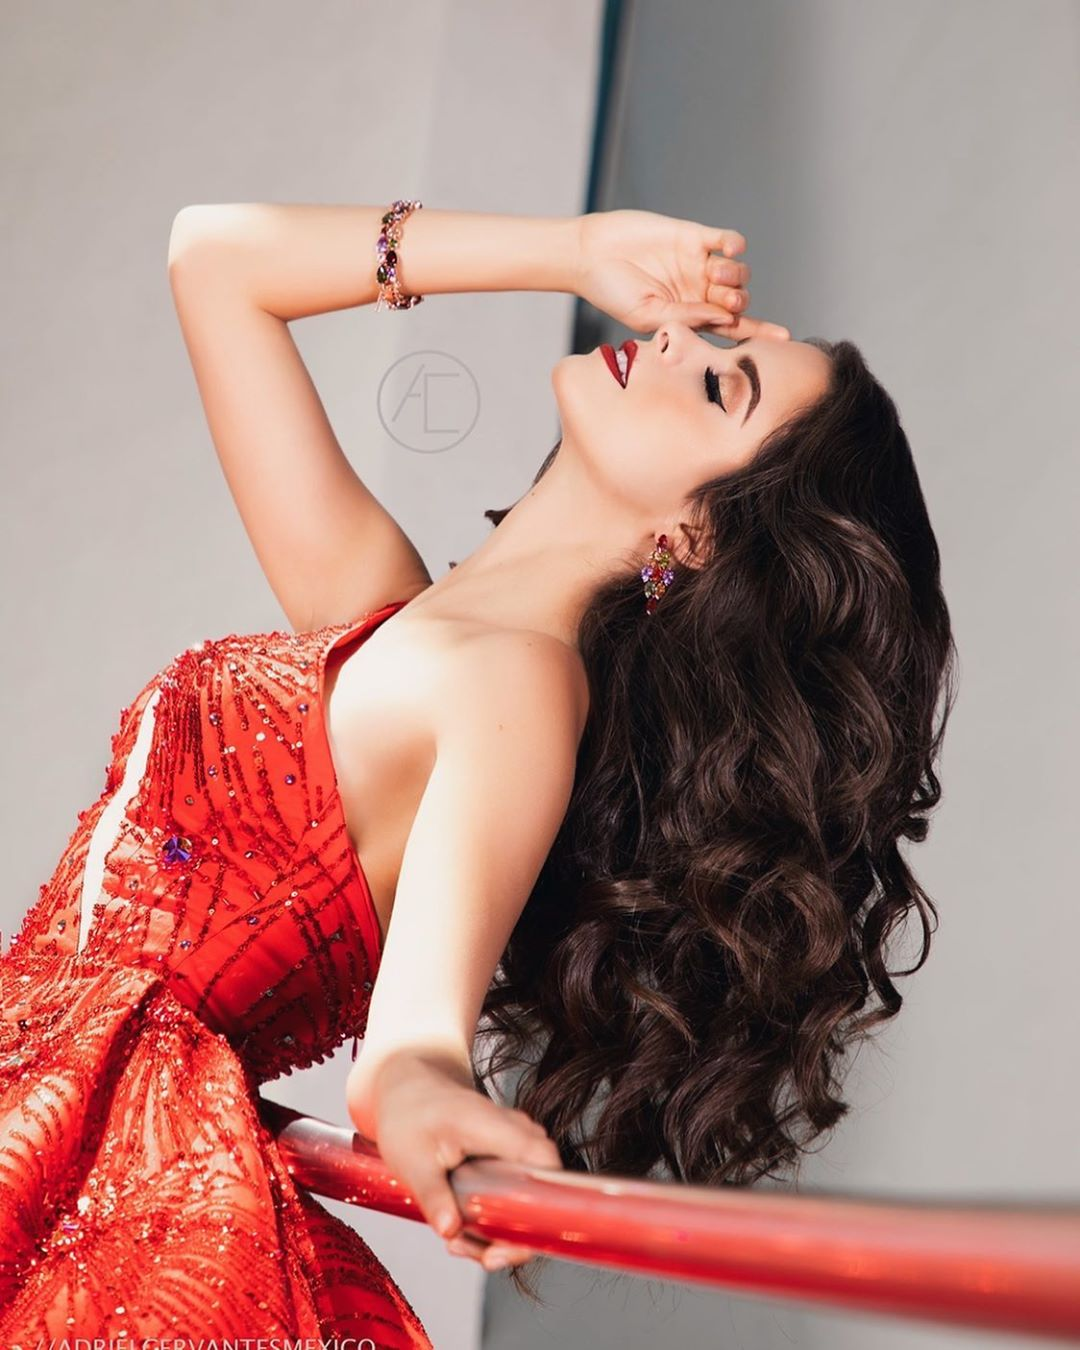 regina peredo, reyna hispanoamericana 2019. - Página 2 67509910